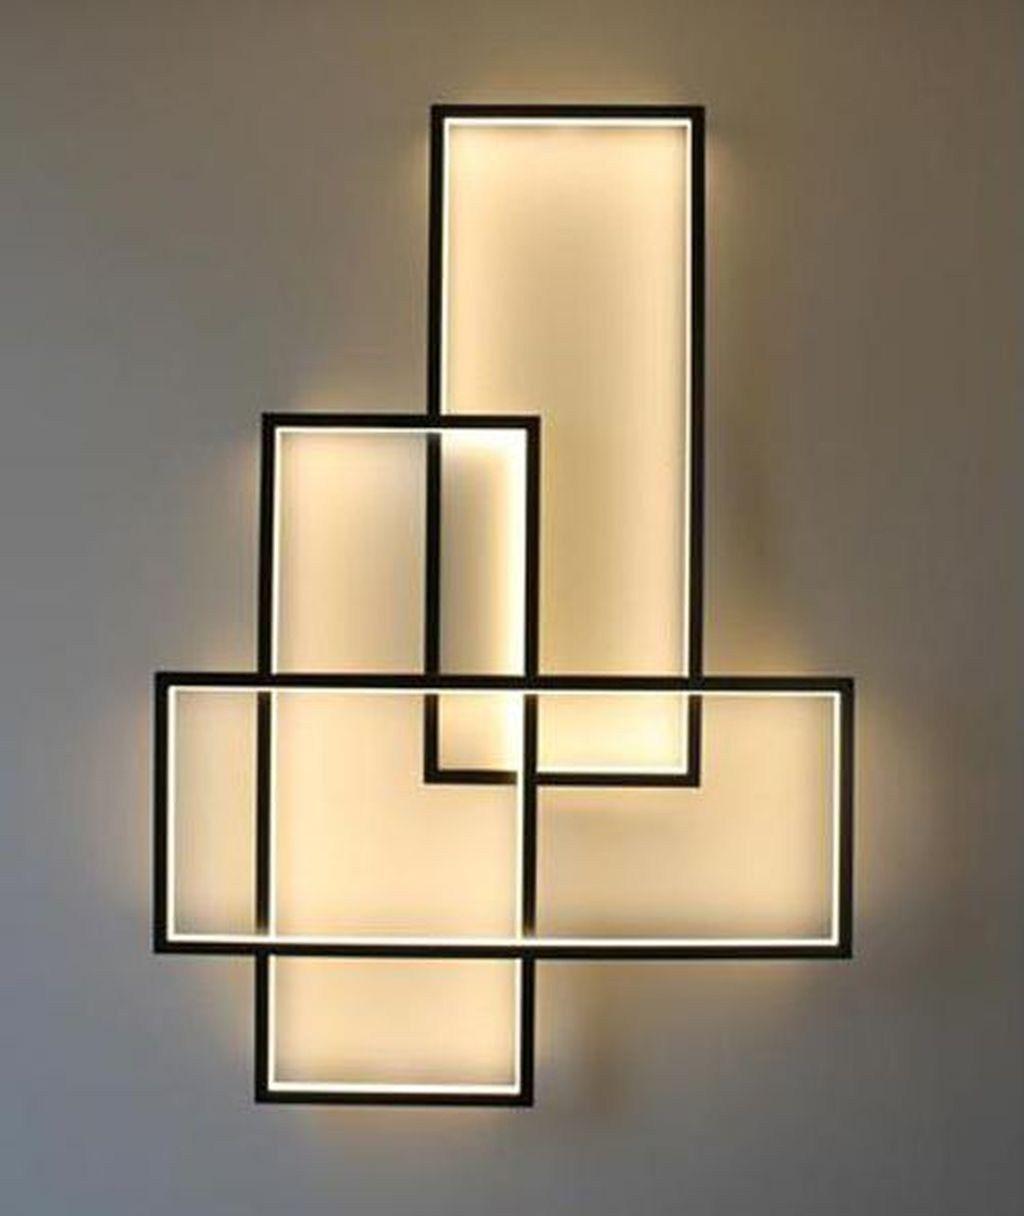 Decoomo Trends Home Decoration Ideas Lampu Hias Led Desain Lampu Lampu